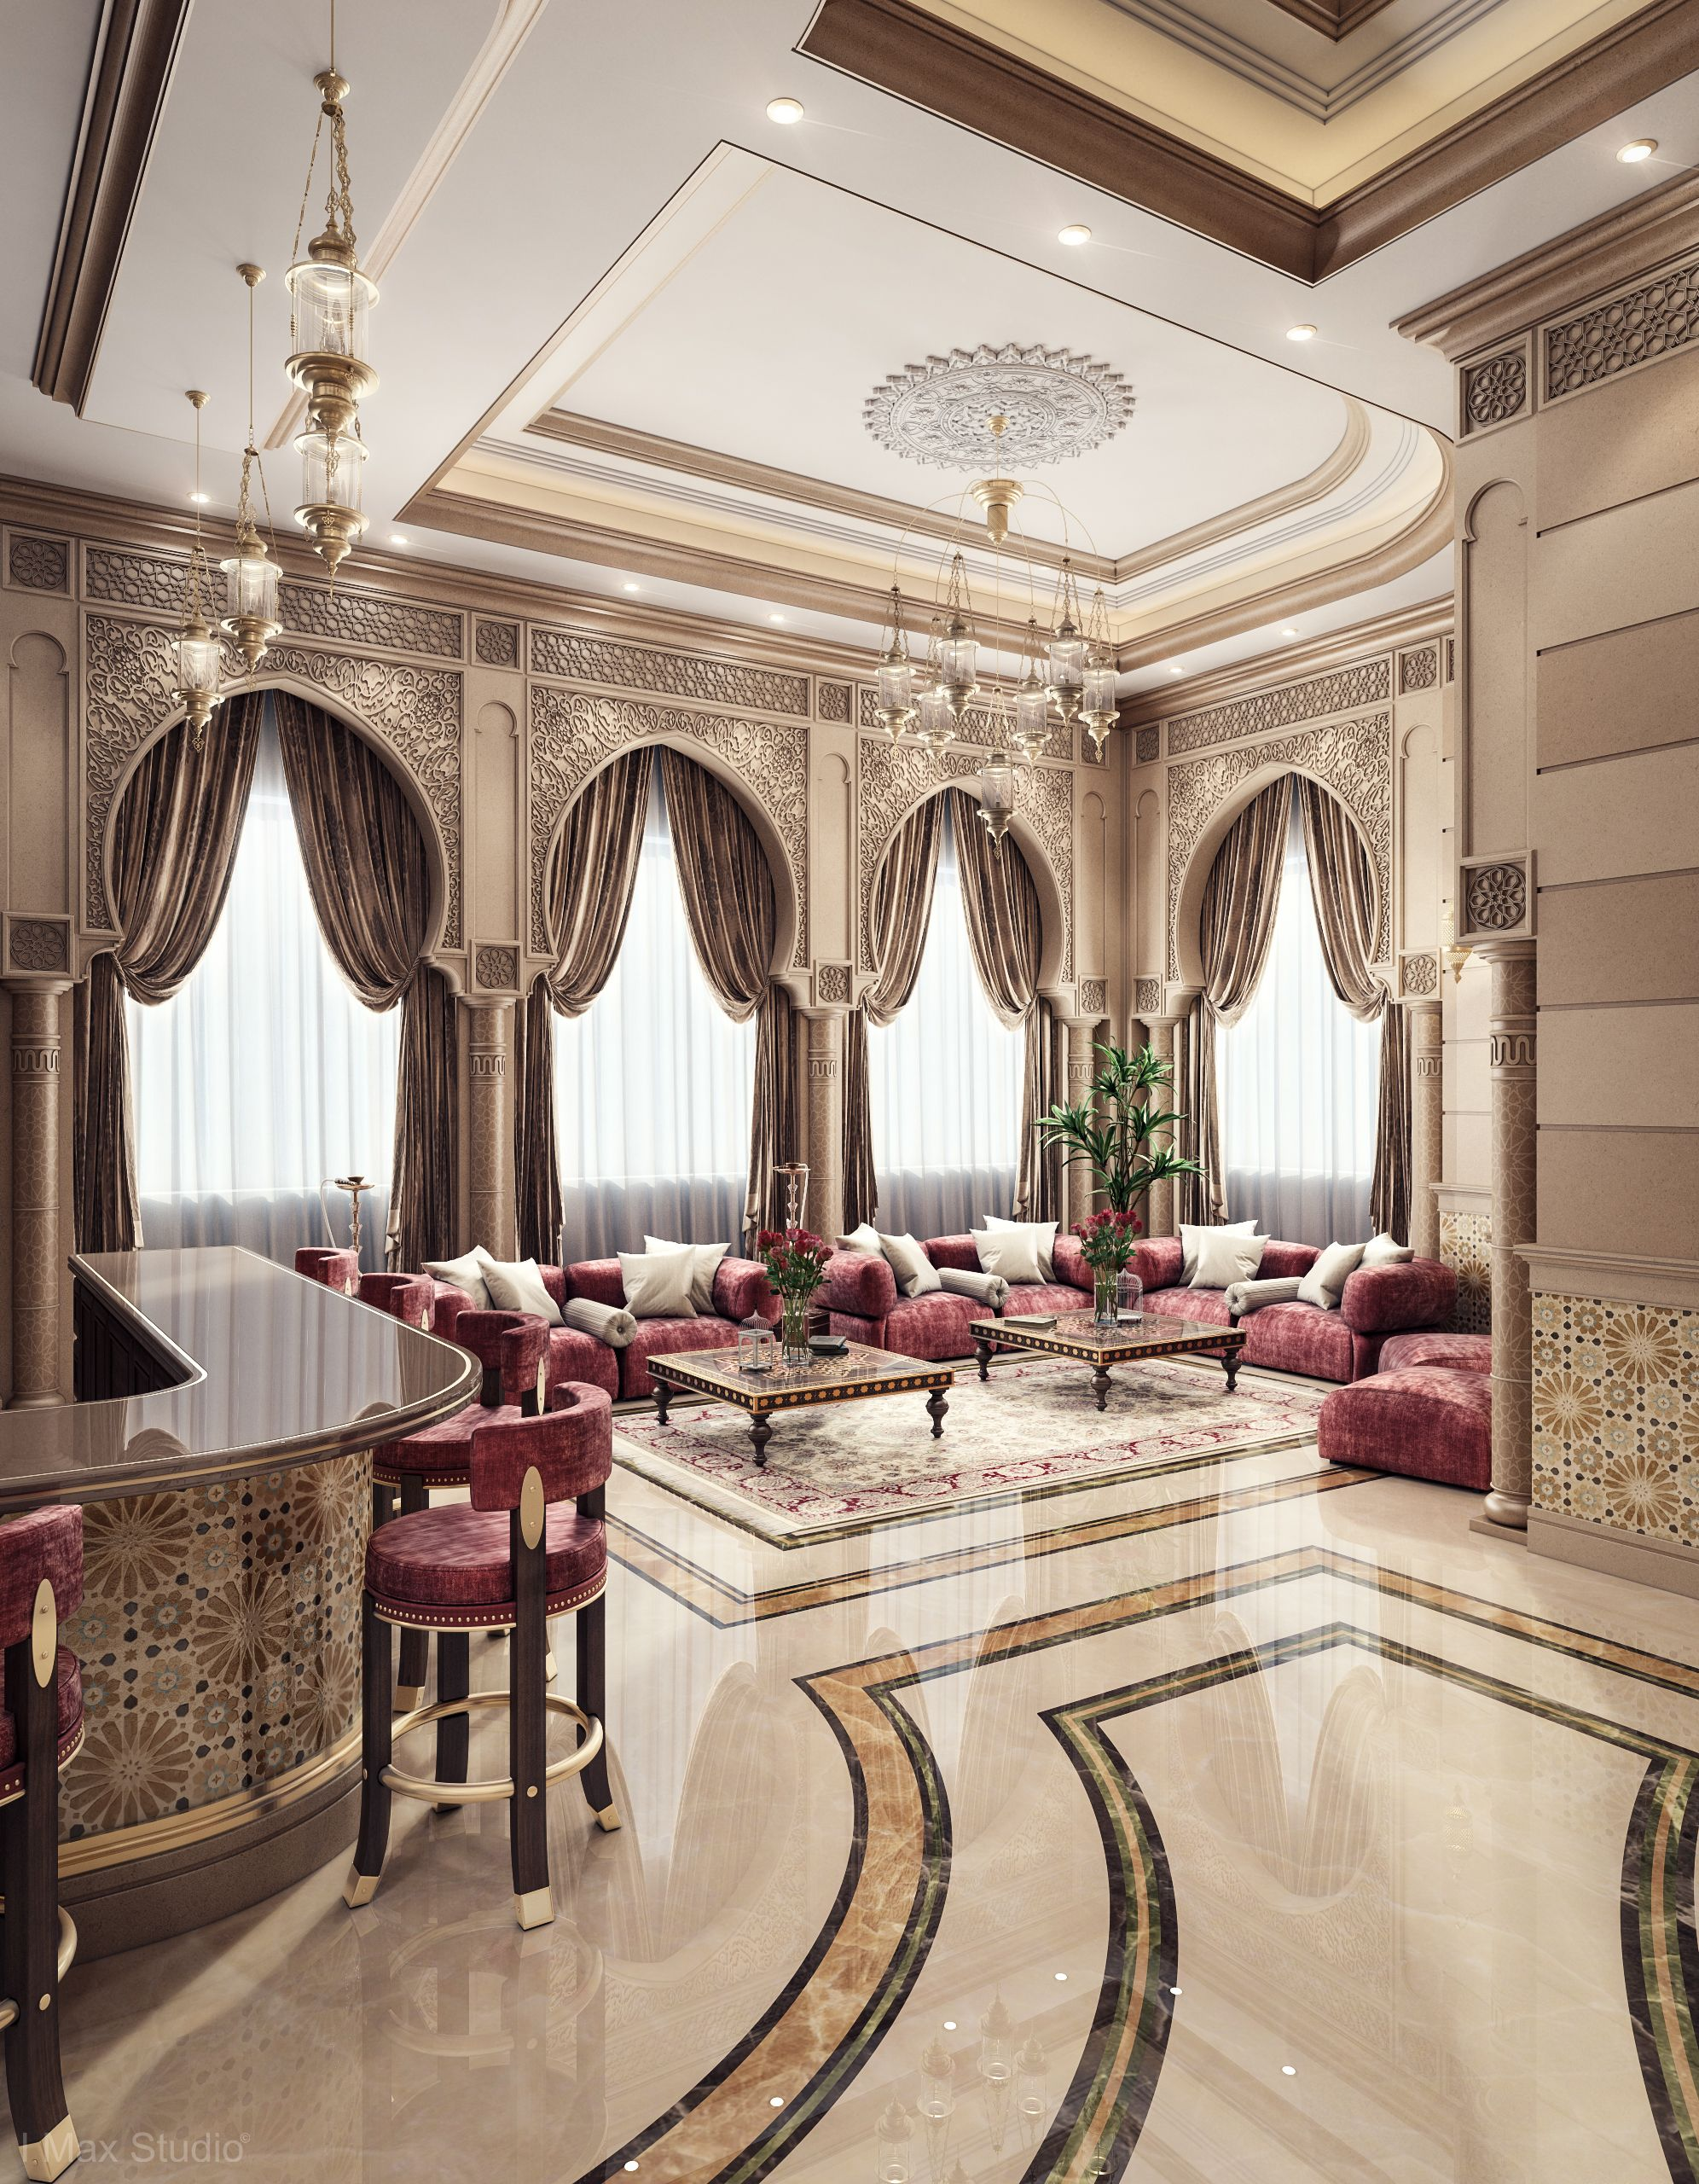 Men majlis dining room kitchen house design house - Kitchen and dining interior design ...